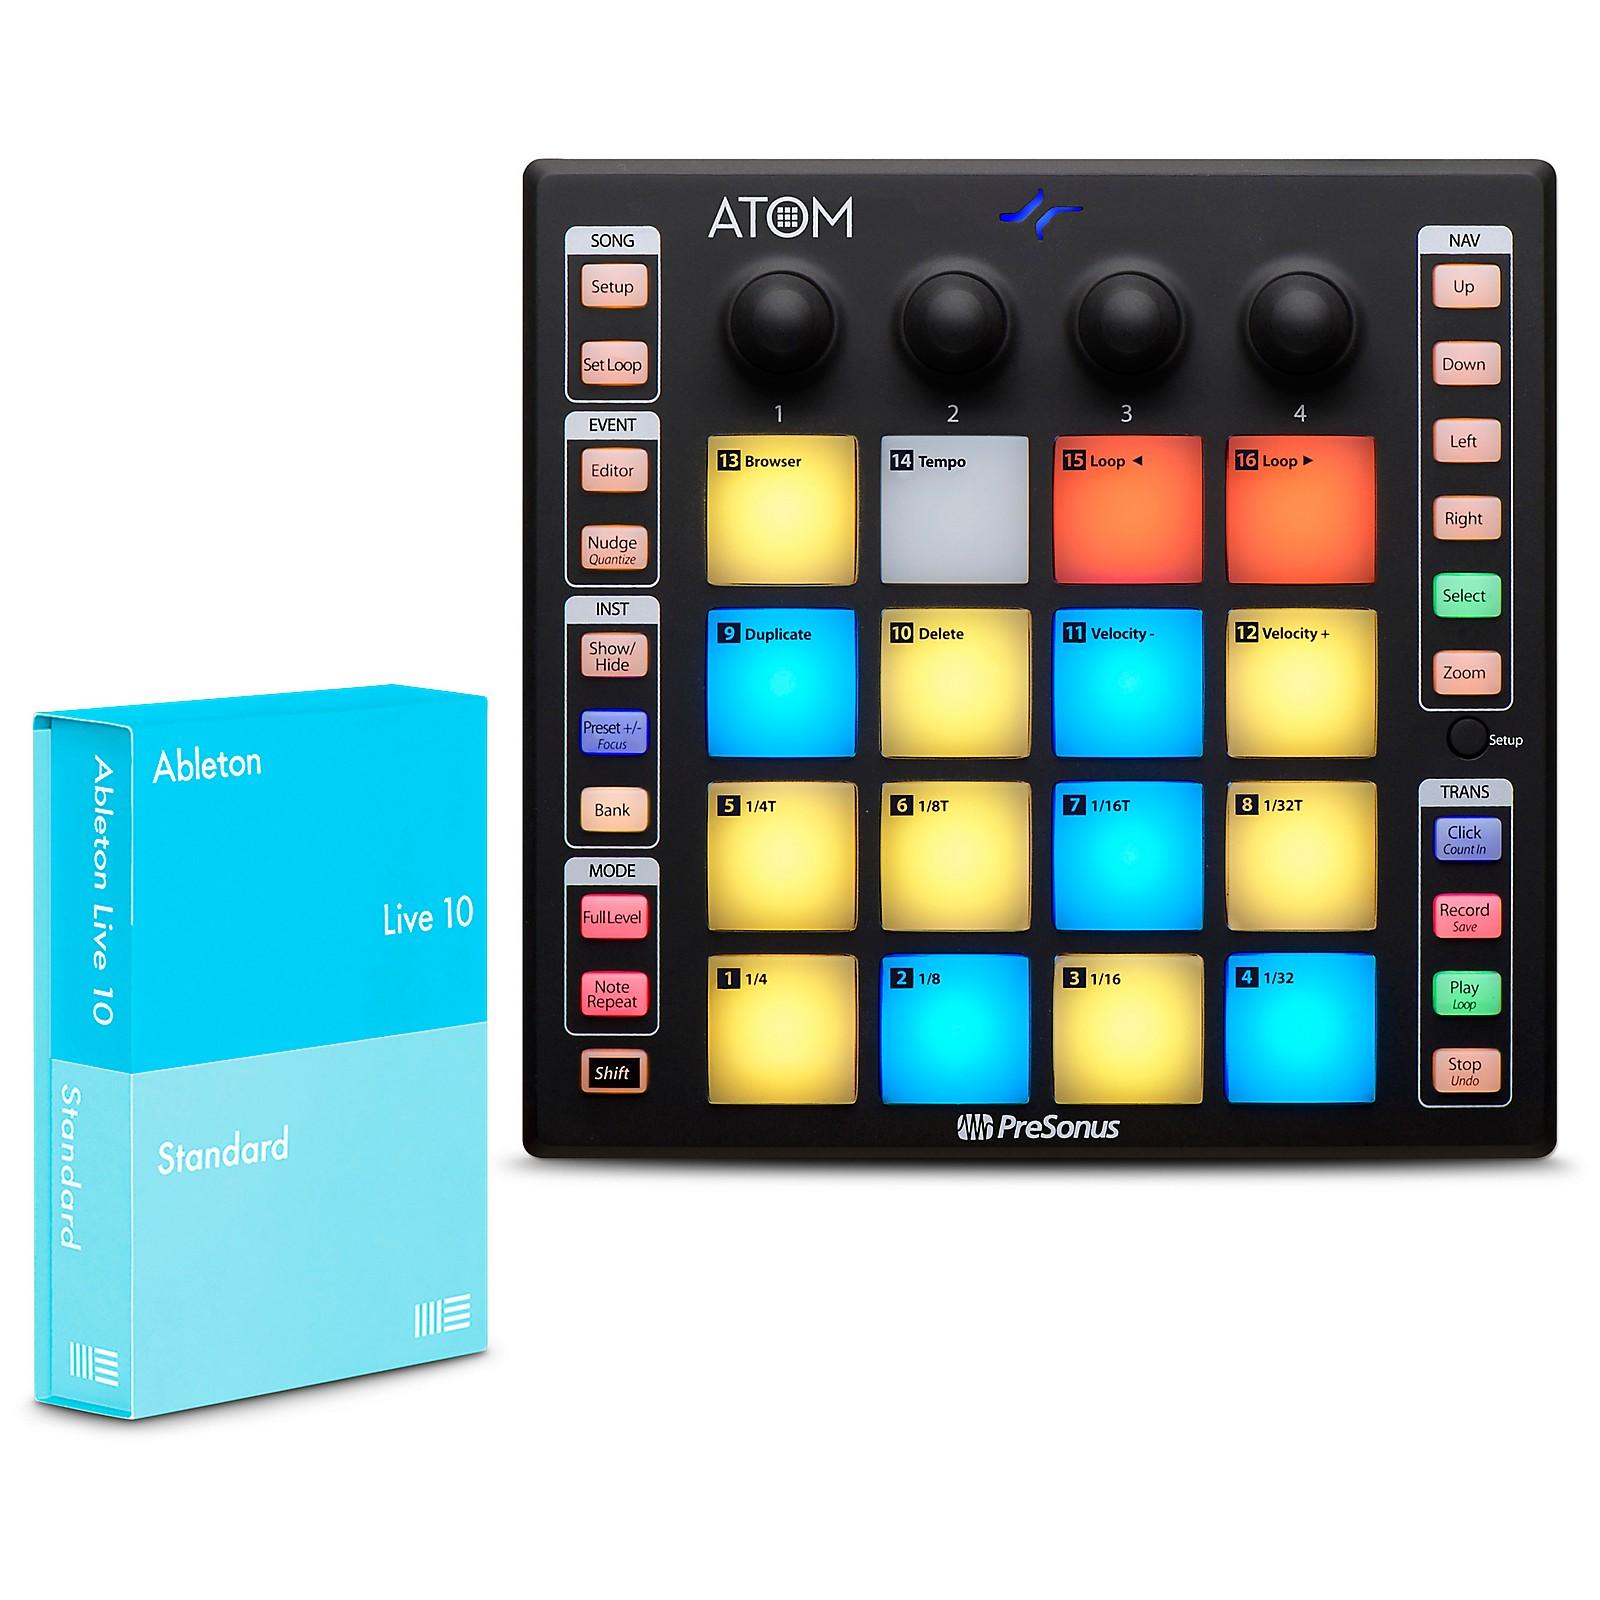 PreSonus ATOM Production Controller and Ableton Live 10